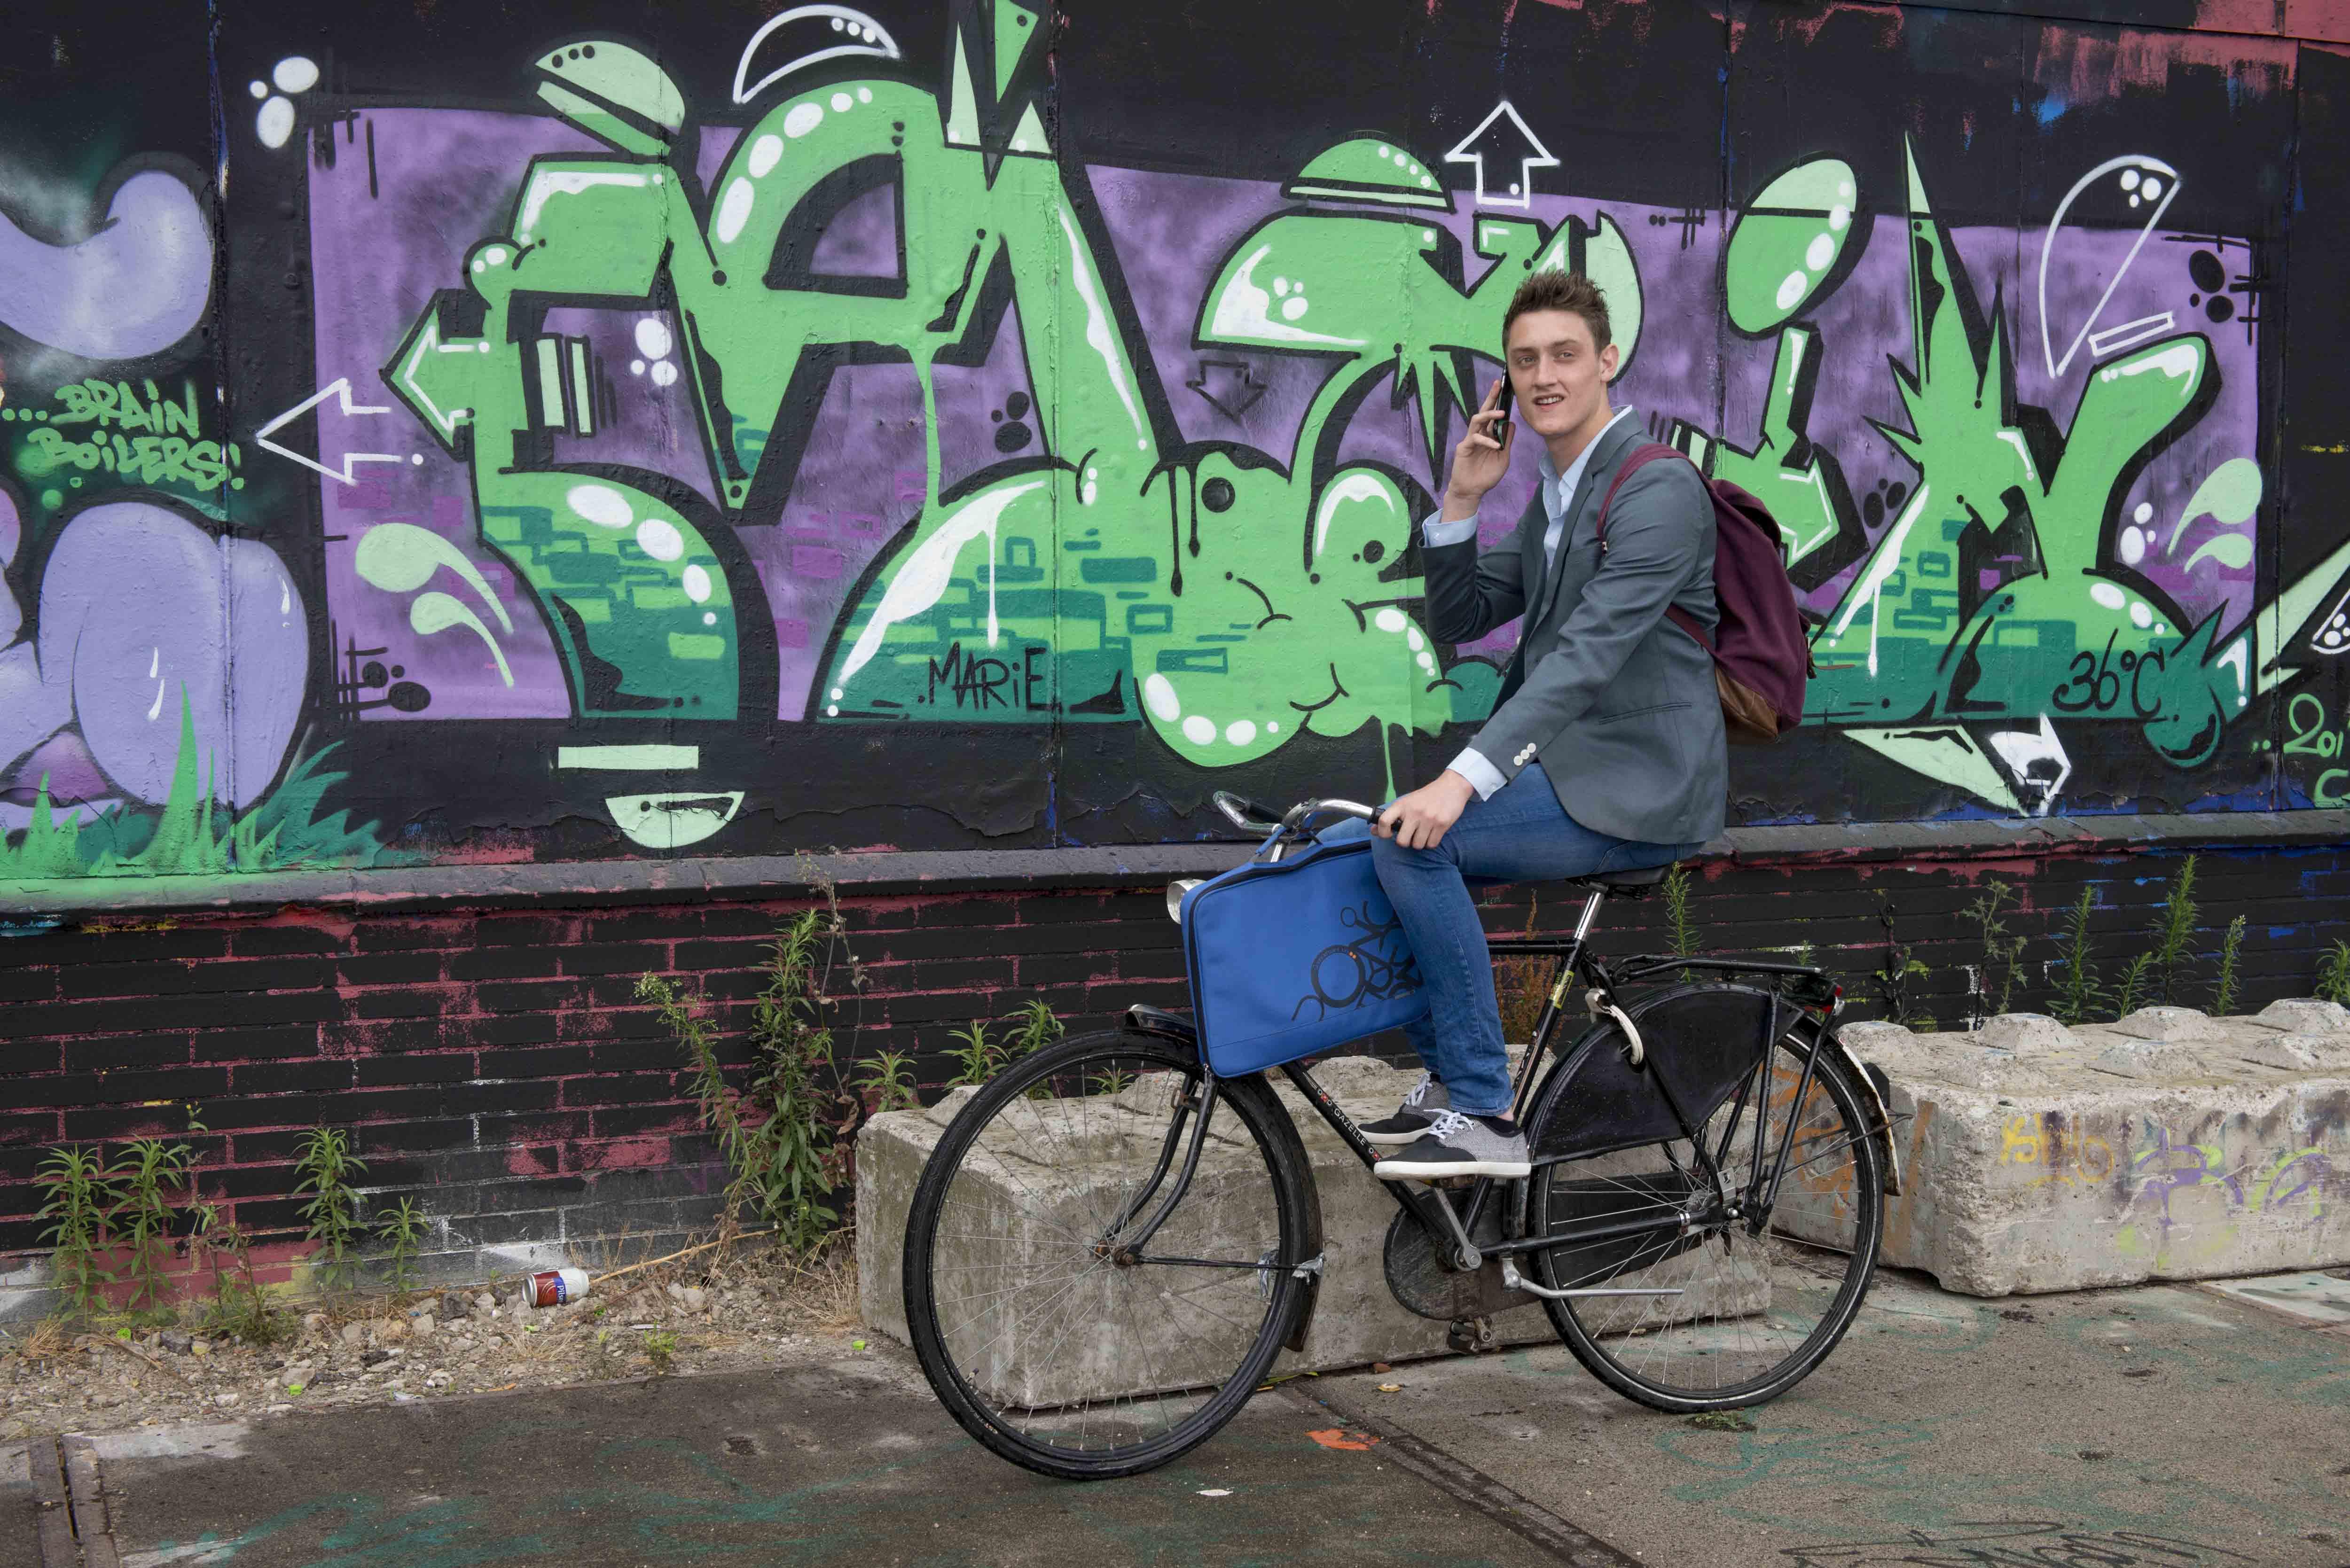 Bram op fiets bellend